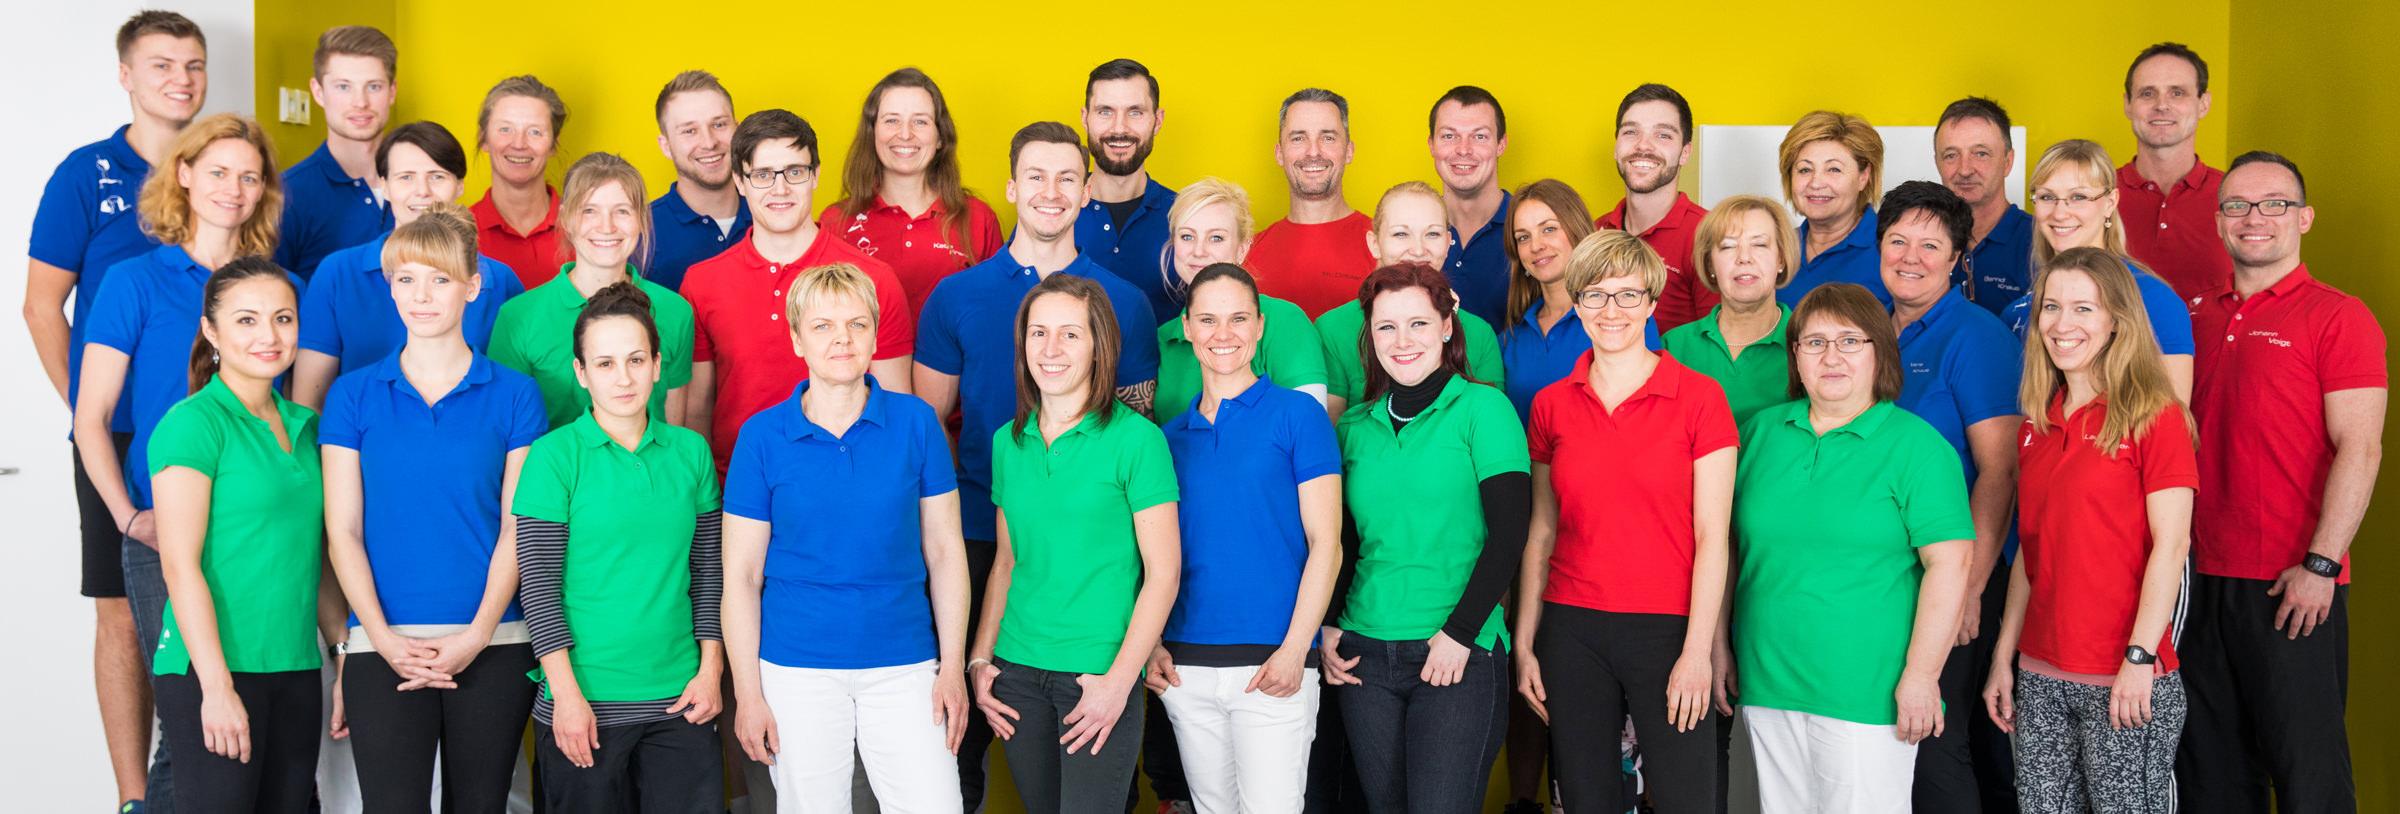 Team-REHA-Zentrum-Erfurt